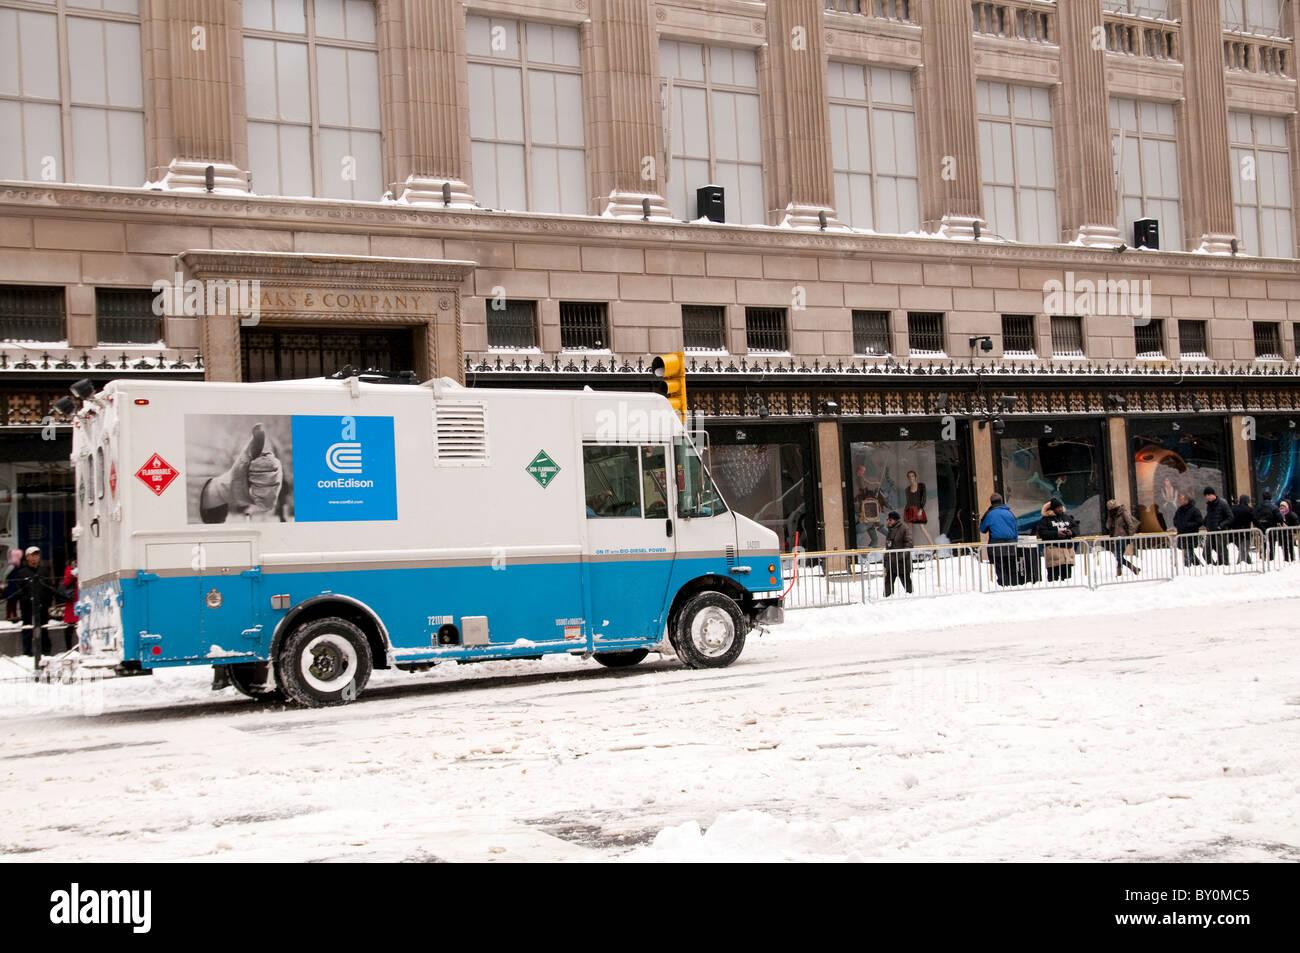 Snow Storm, December 26, 2010, New York City, 5th Avenue, 59th Street vicinity, Manhattan, - Stock Image